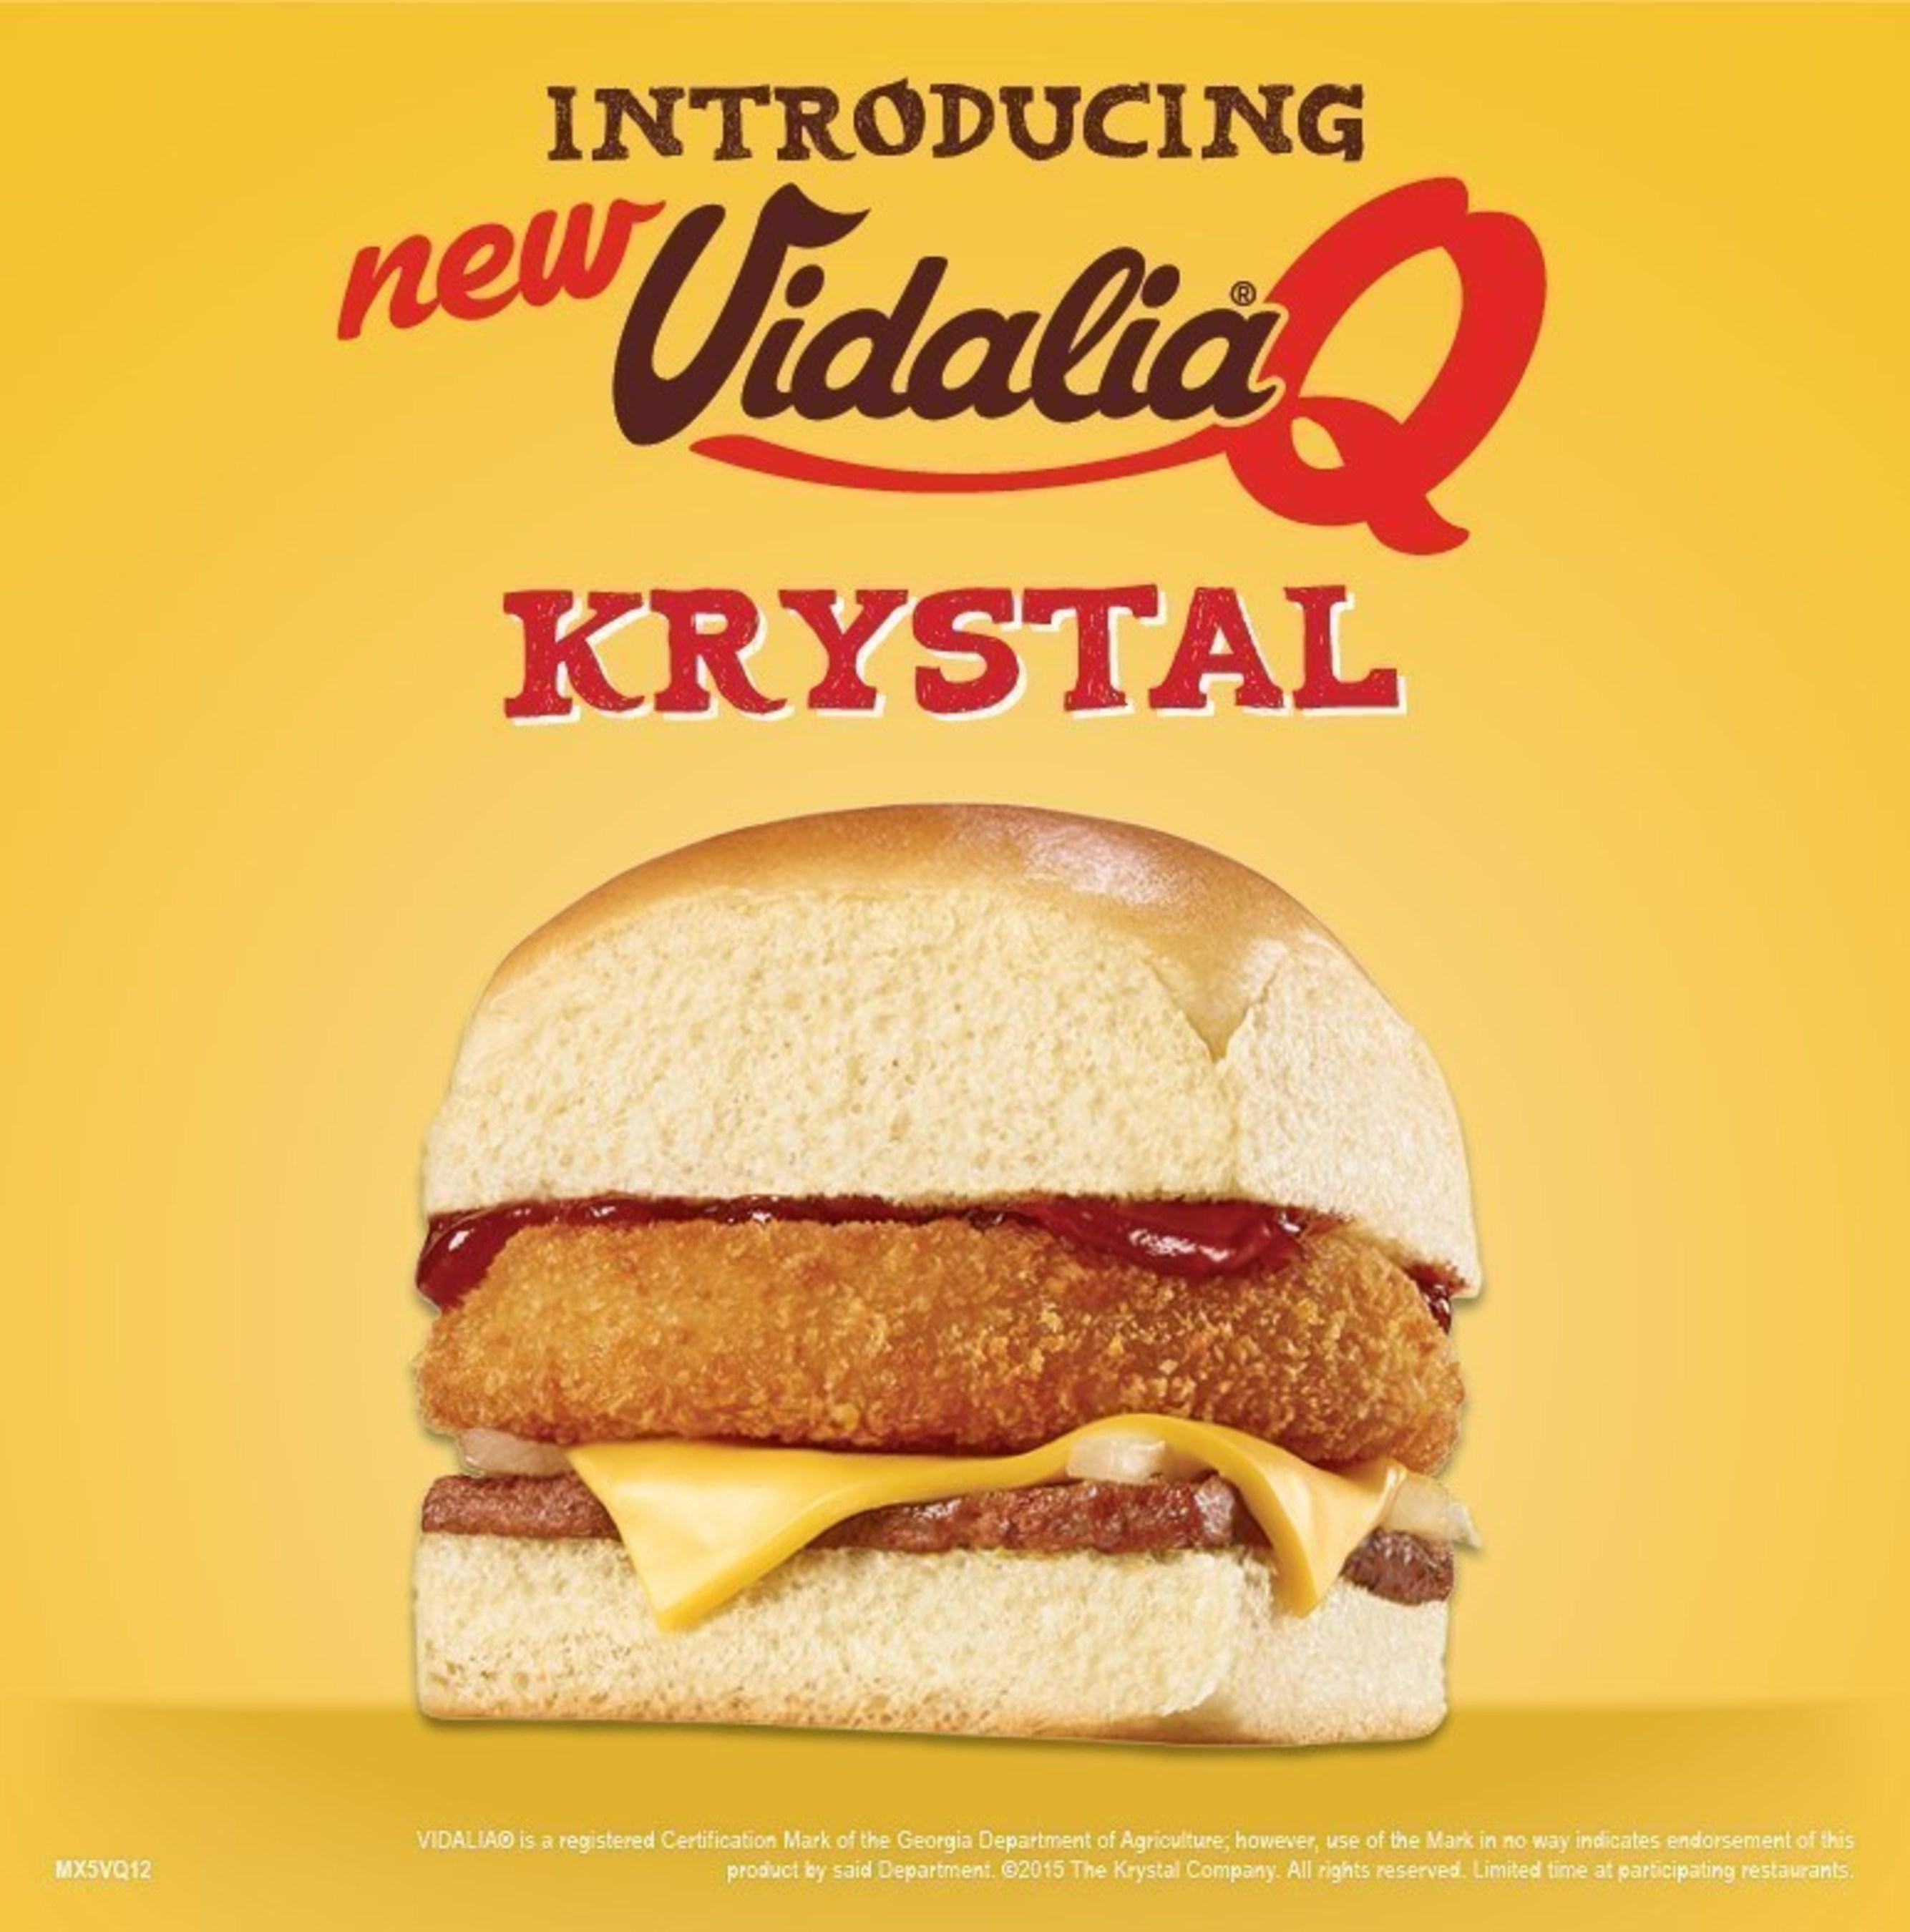 Krystal® Offers a Big, Vidalia-Sweet Value with Free Specialty Krystal Offer